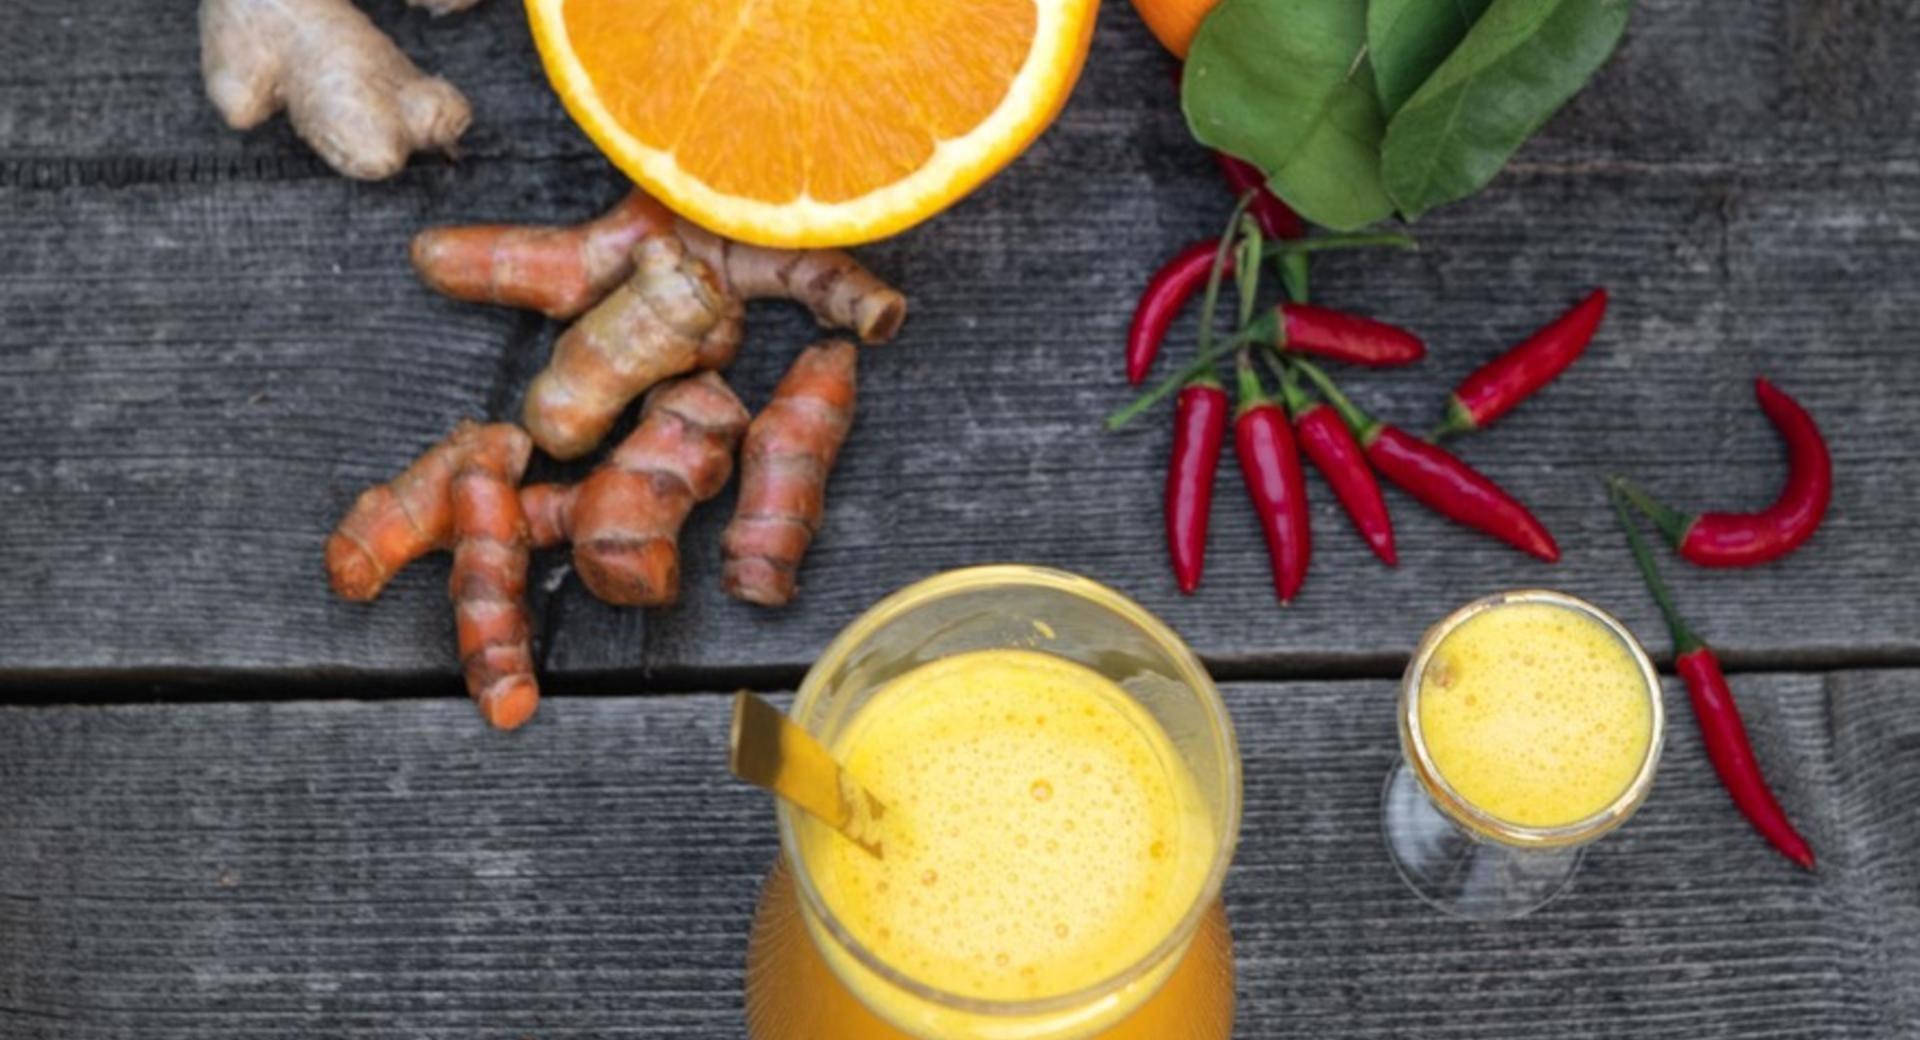 Chupito de jengibre y naranja-mejora tu sistema inmunológico